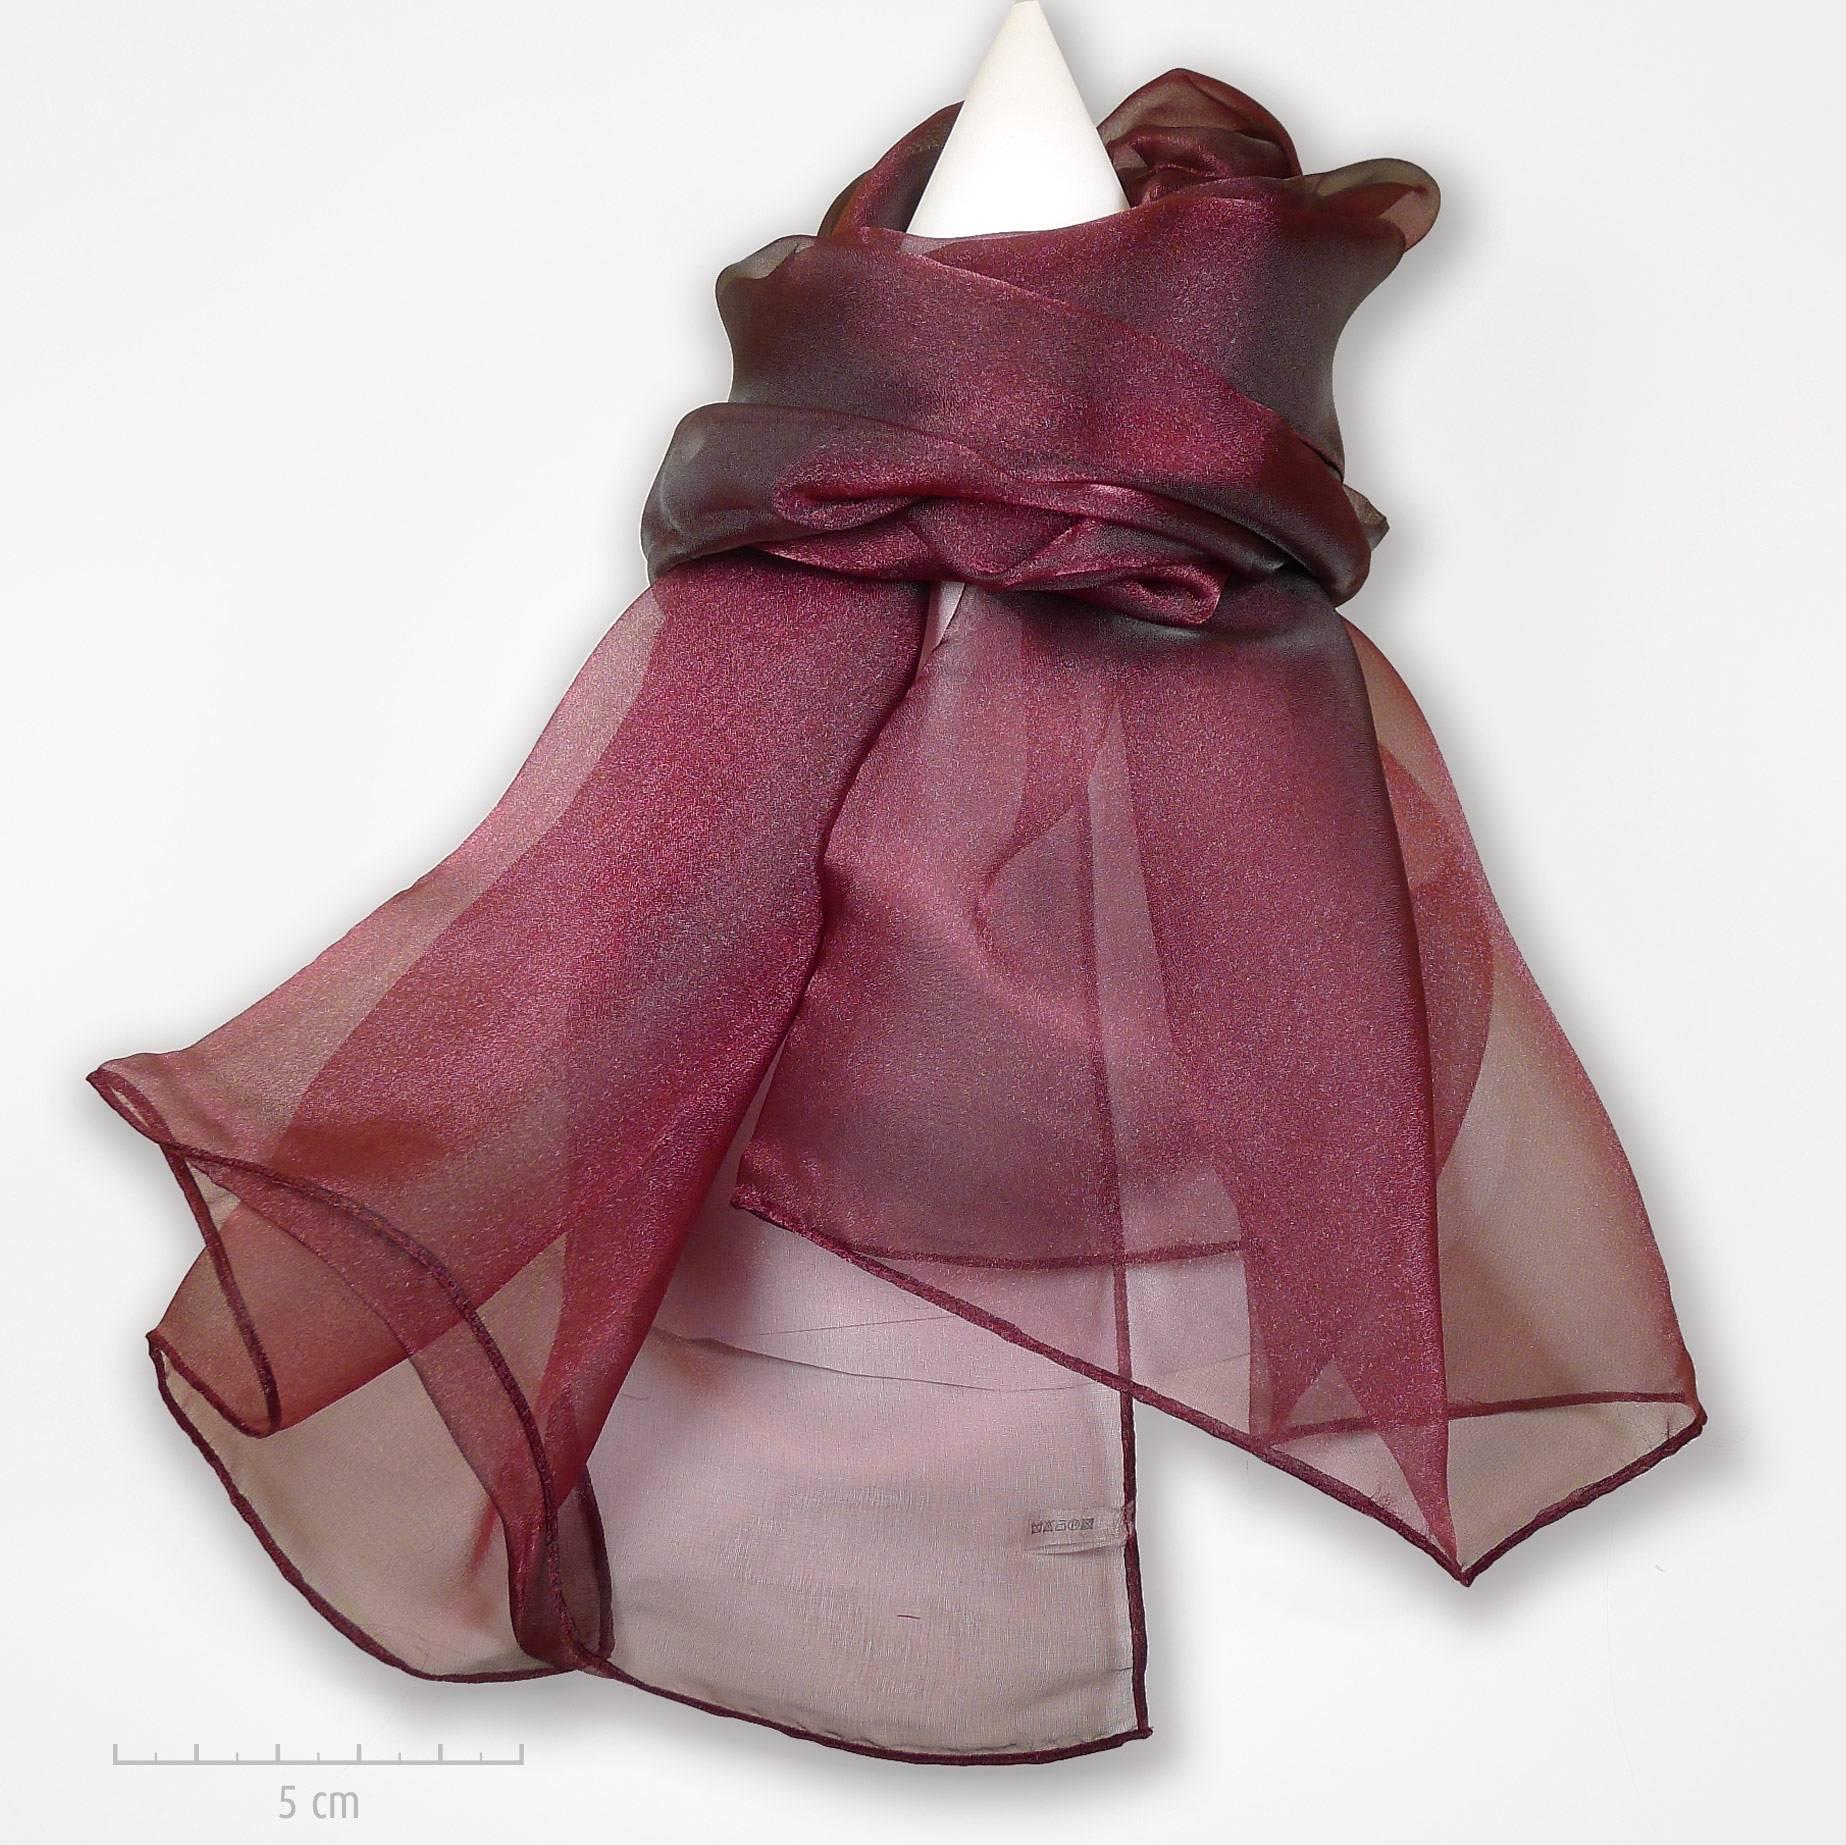 Grande étole unie bordeaux aubergine et reflets framboise. Foulard habillé  de transparence d organdi da6ab3baa29